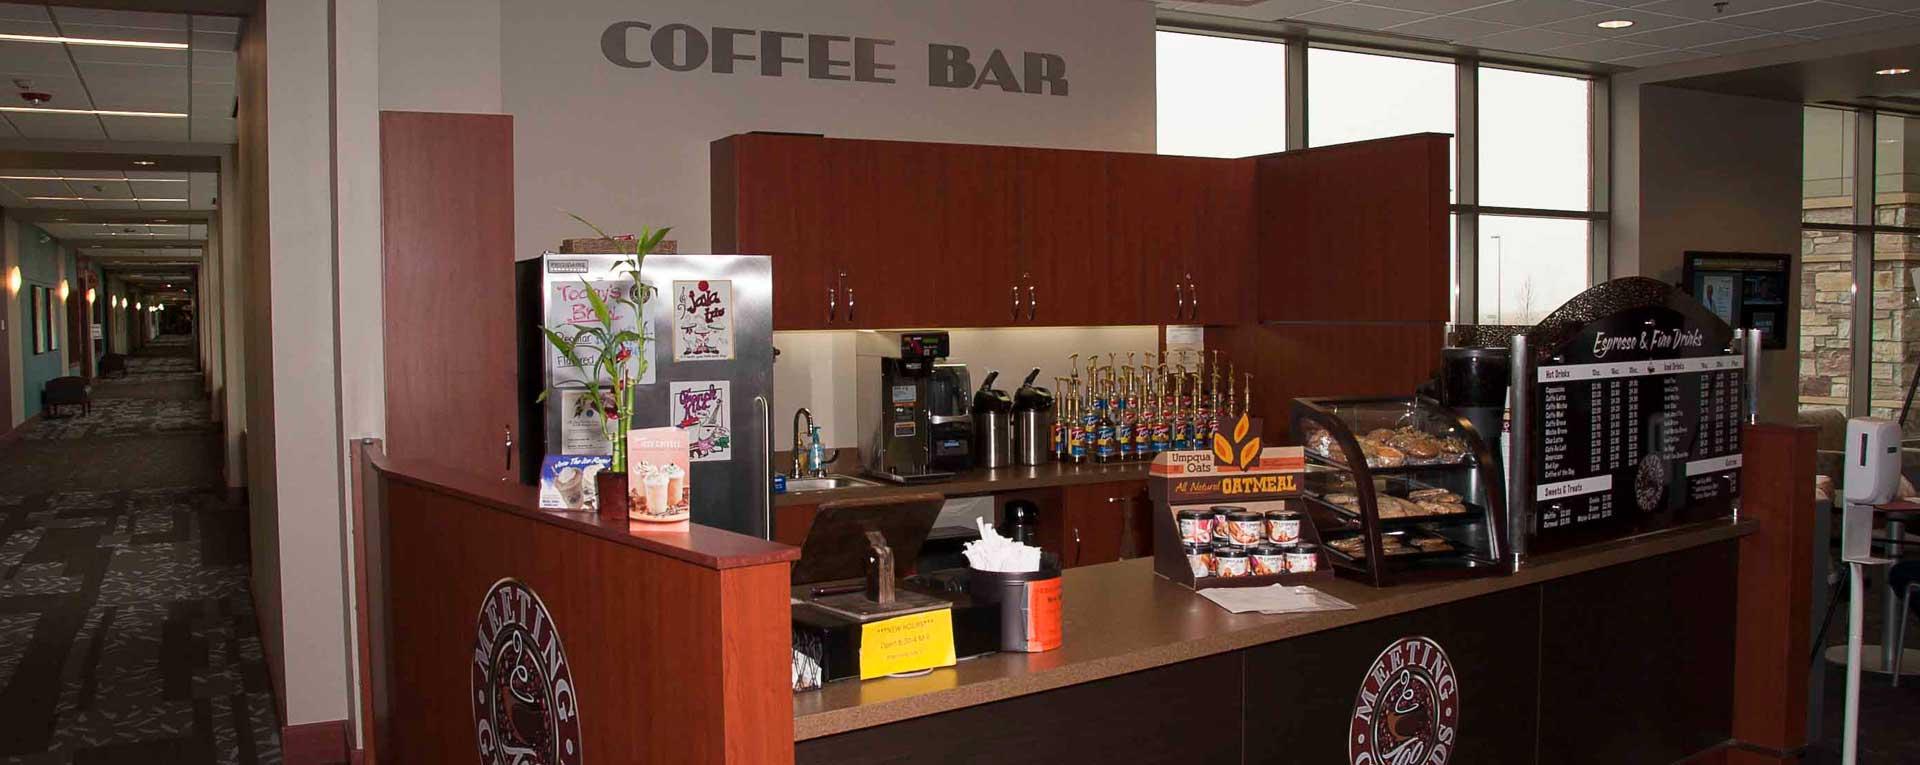 Jamestown Medical Building Coffee Bar